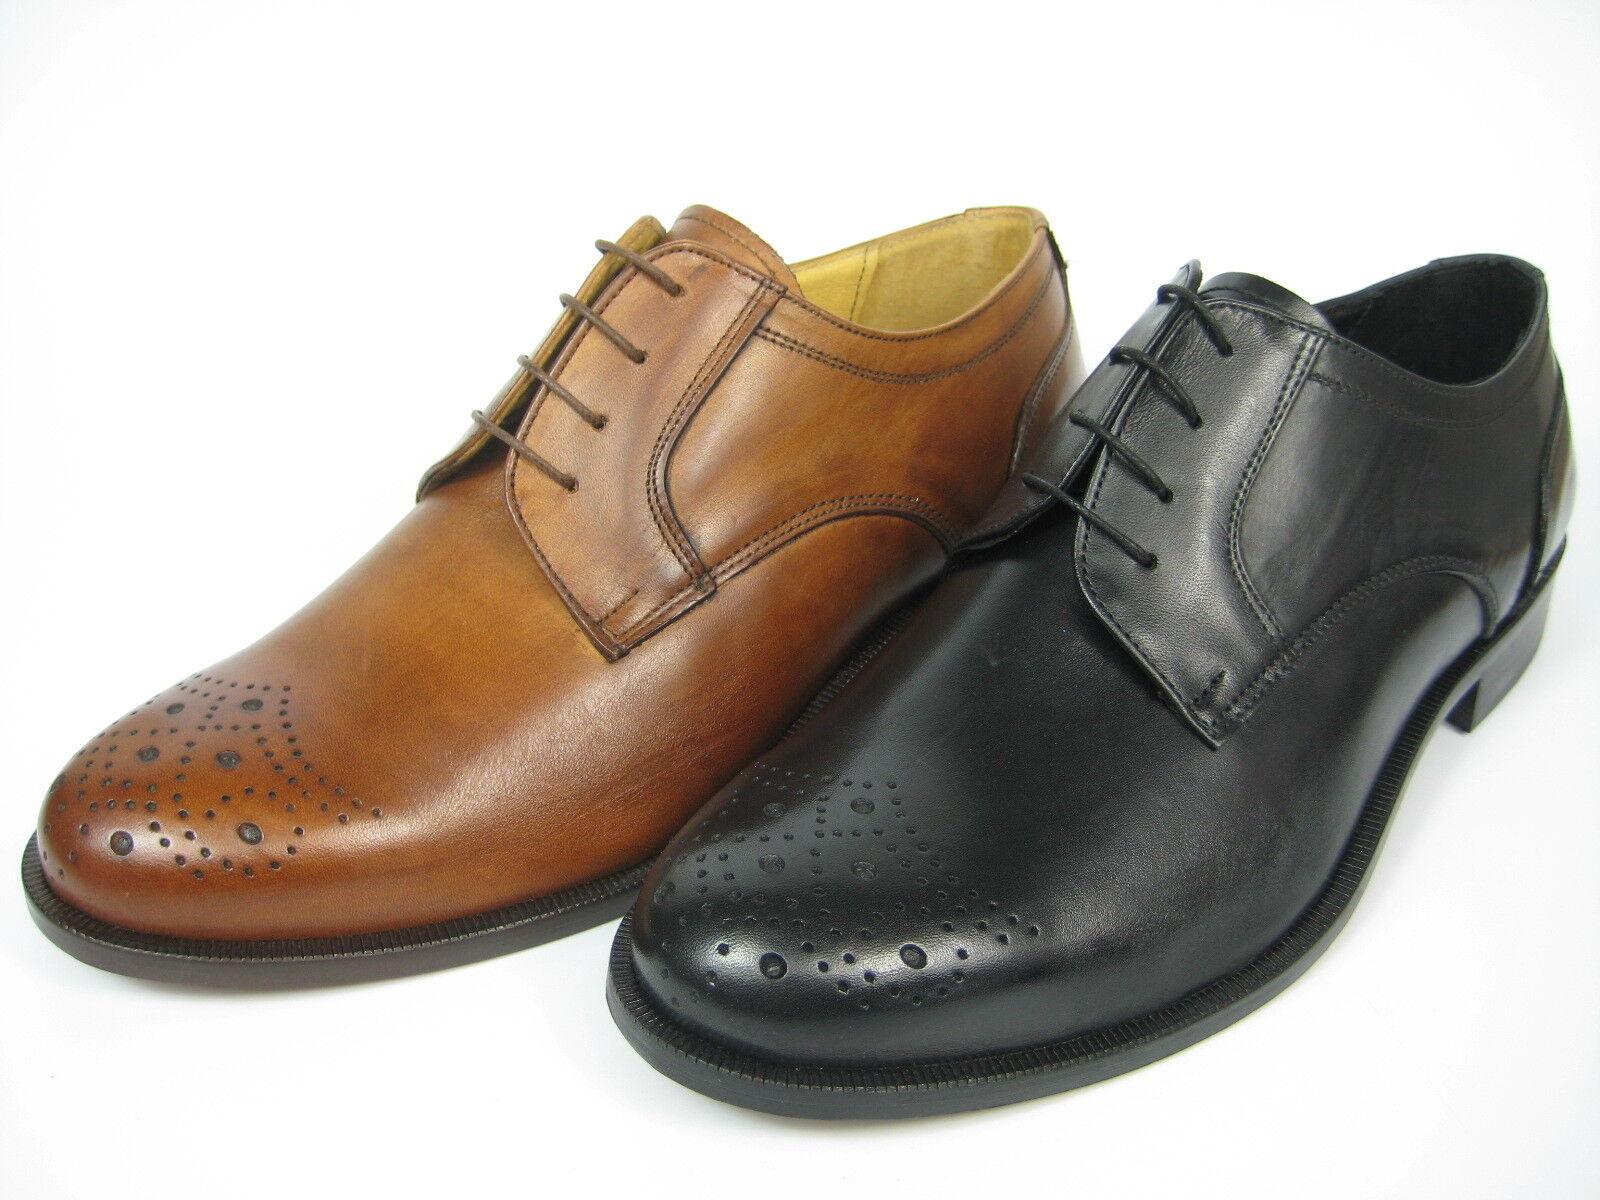 GIORGIO SCARPE 13114 Derby Leder Schuh Handgenäht Ledersohle schwarz/whisky